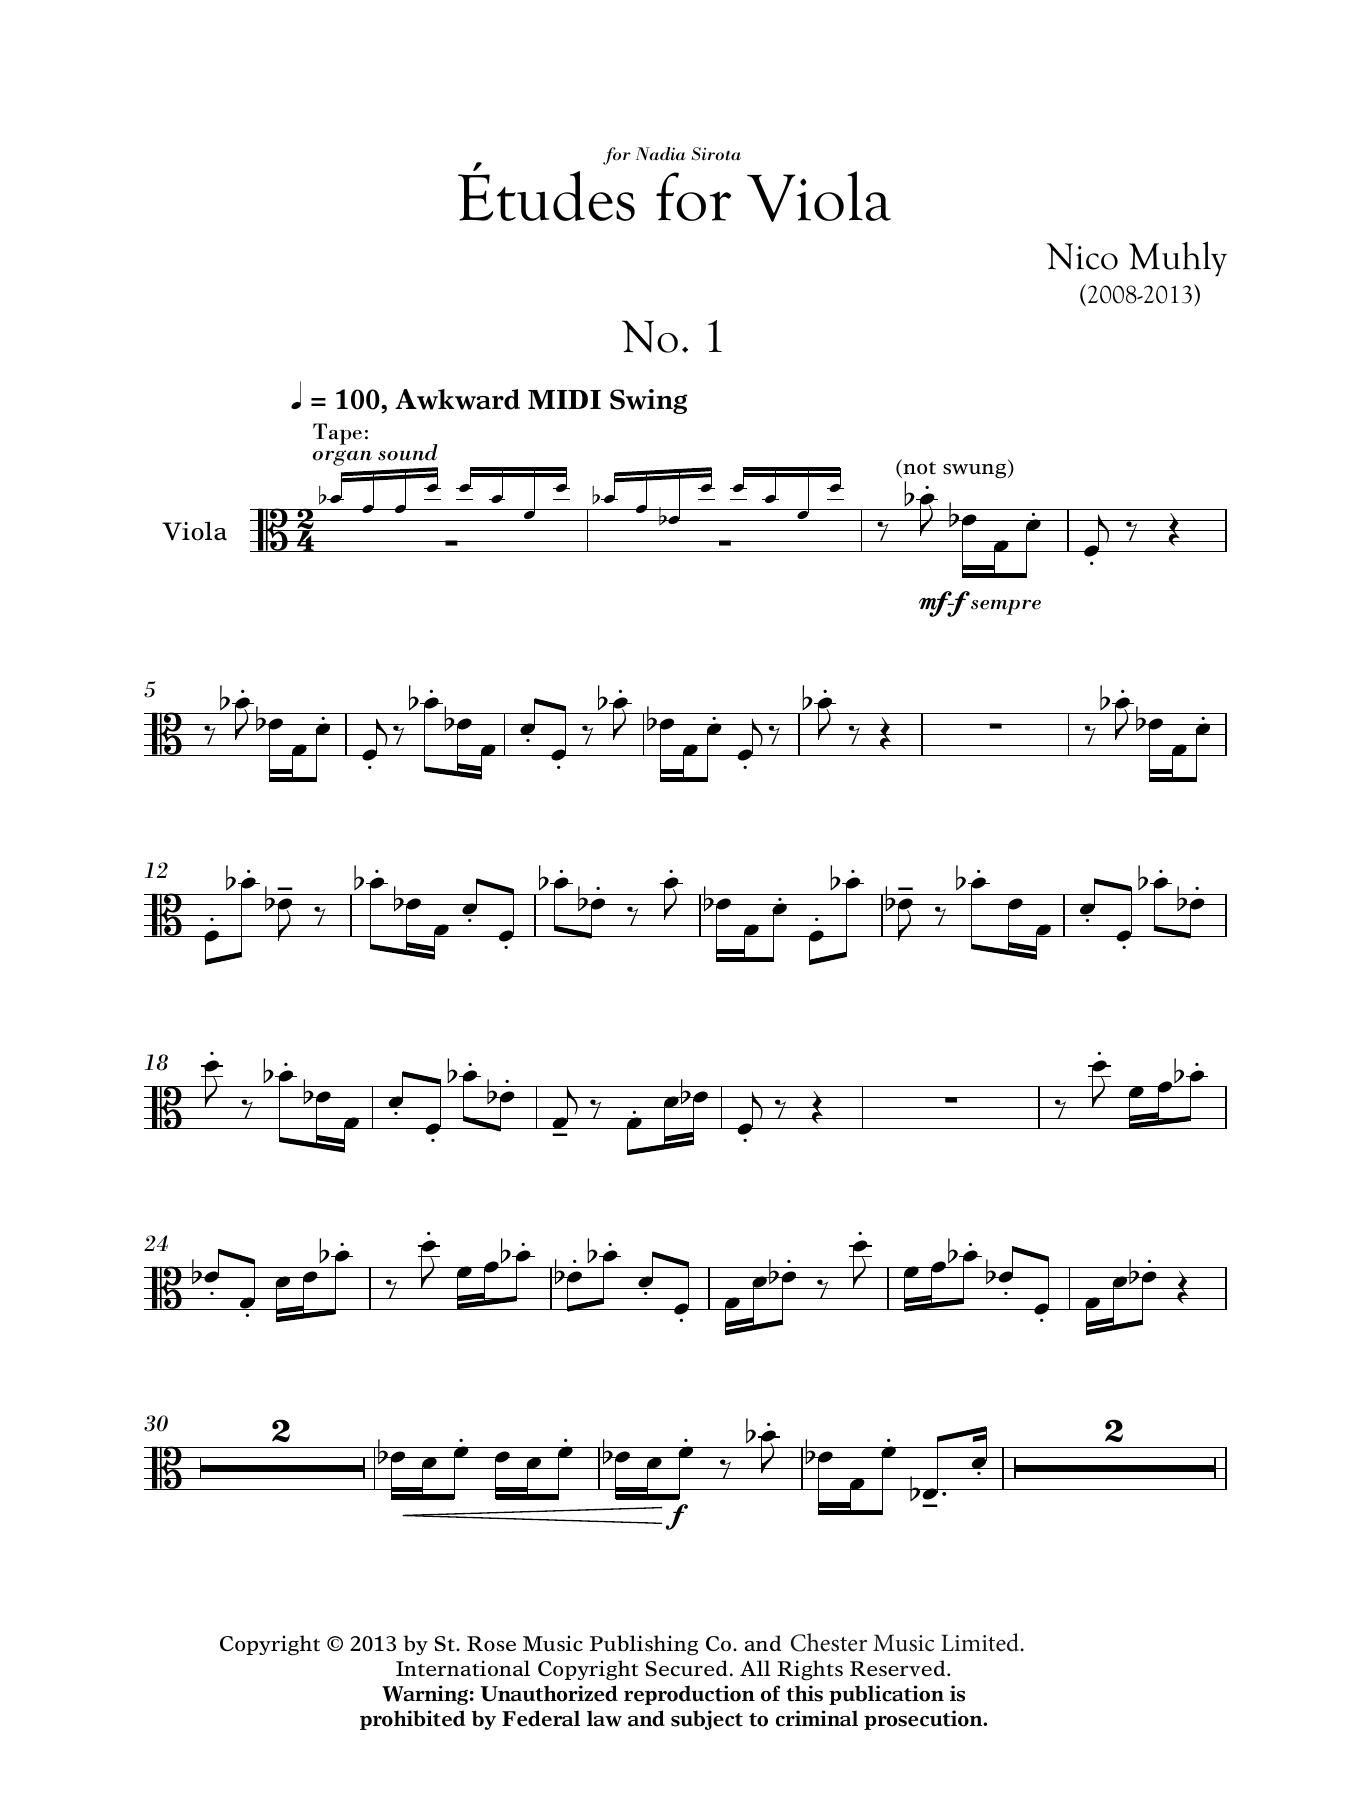 Nico Muhly: Three Etudes For Viola